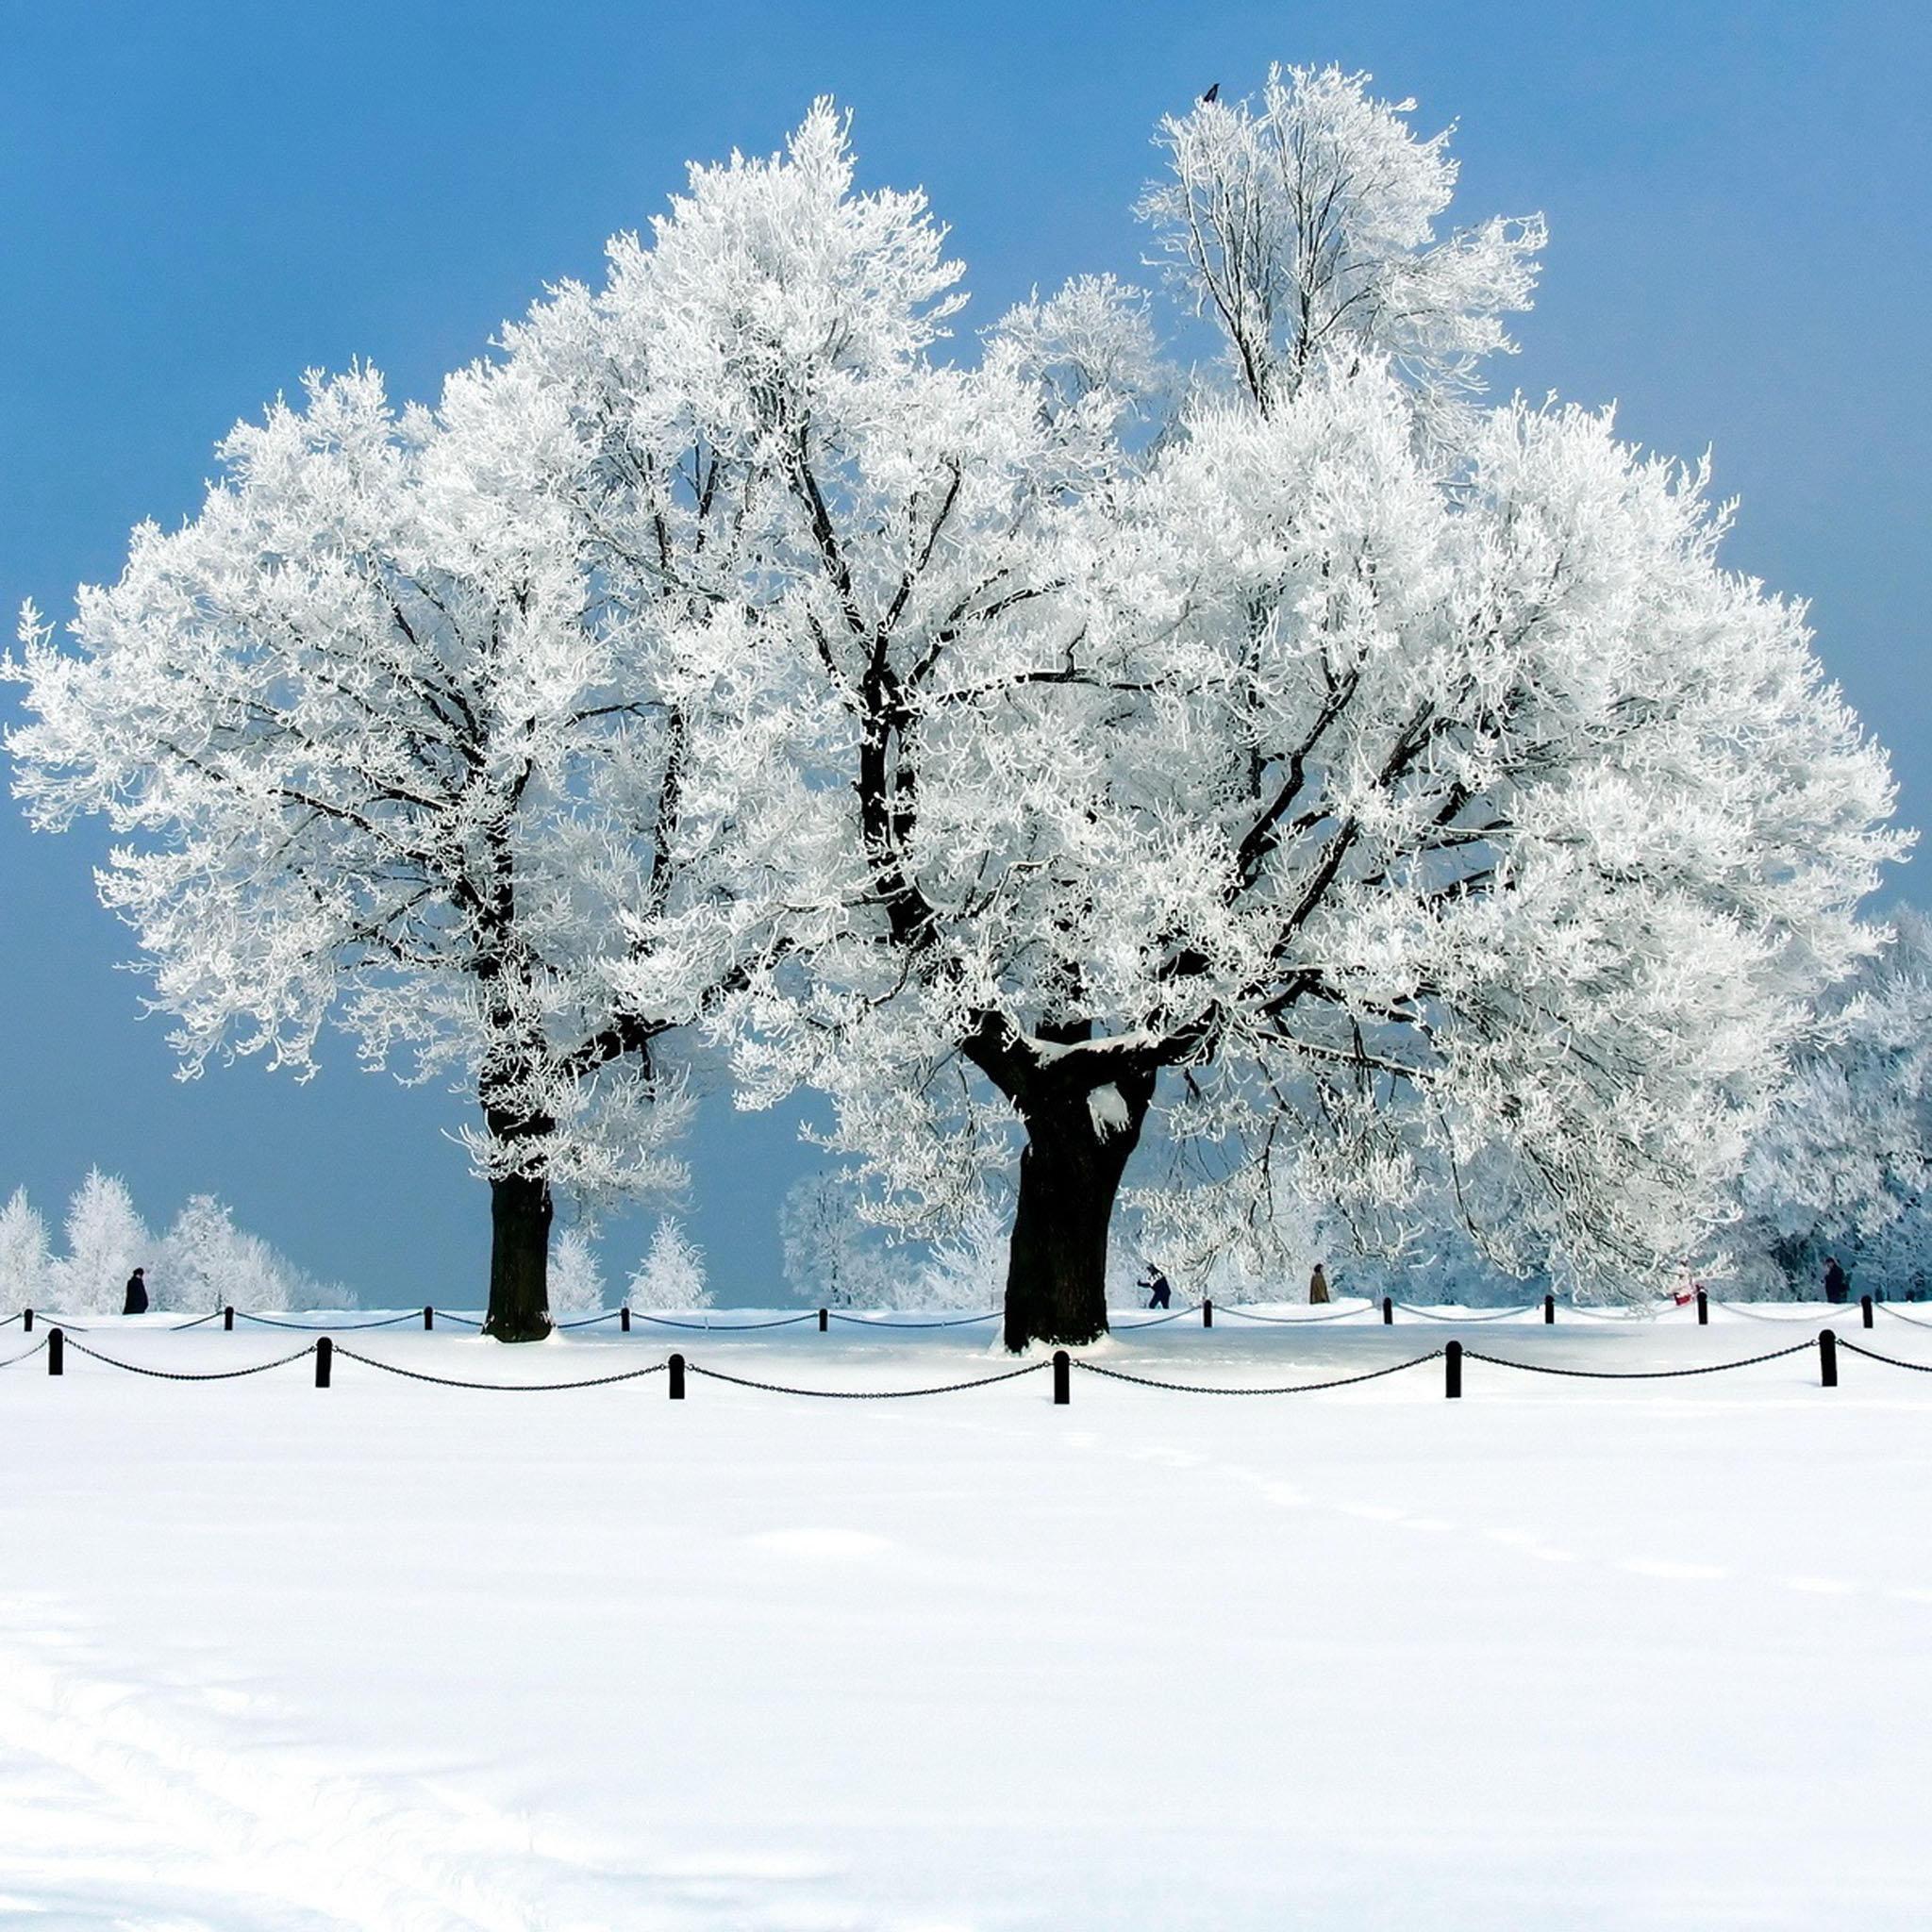 Beautiful Nature Wallpaper For Android: Beautiful Winter Scenes Desktop Wallpapers